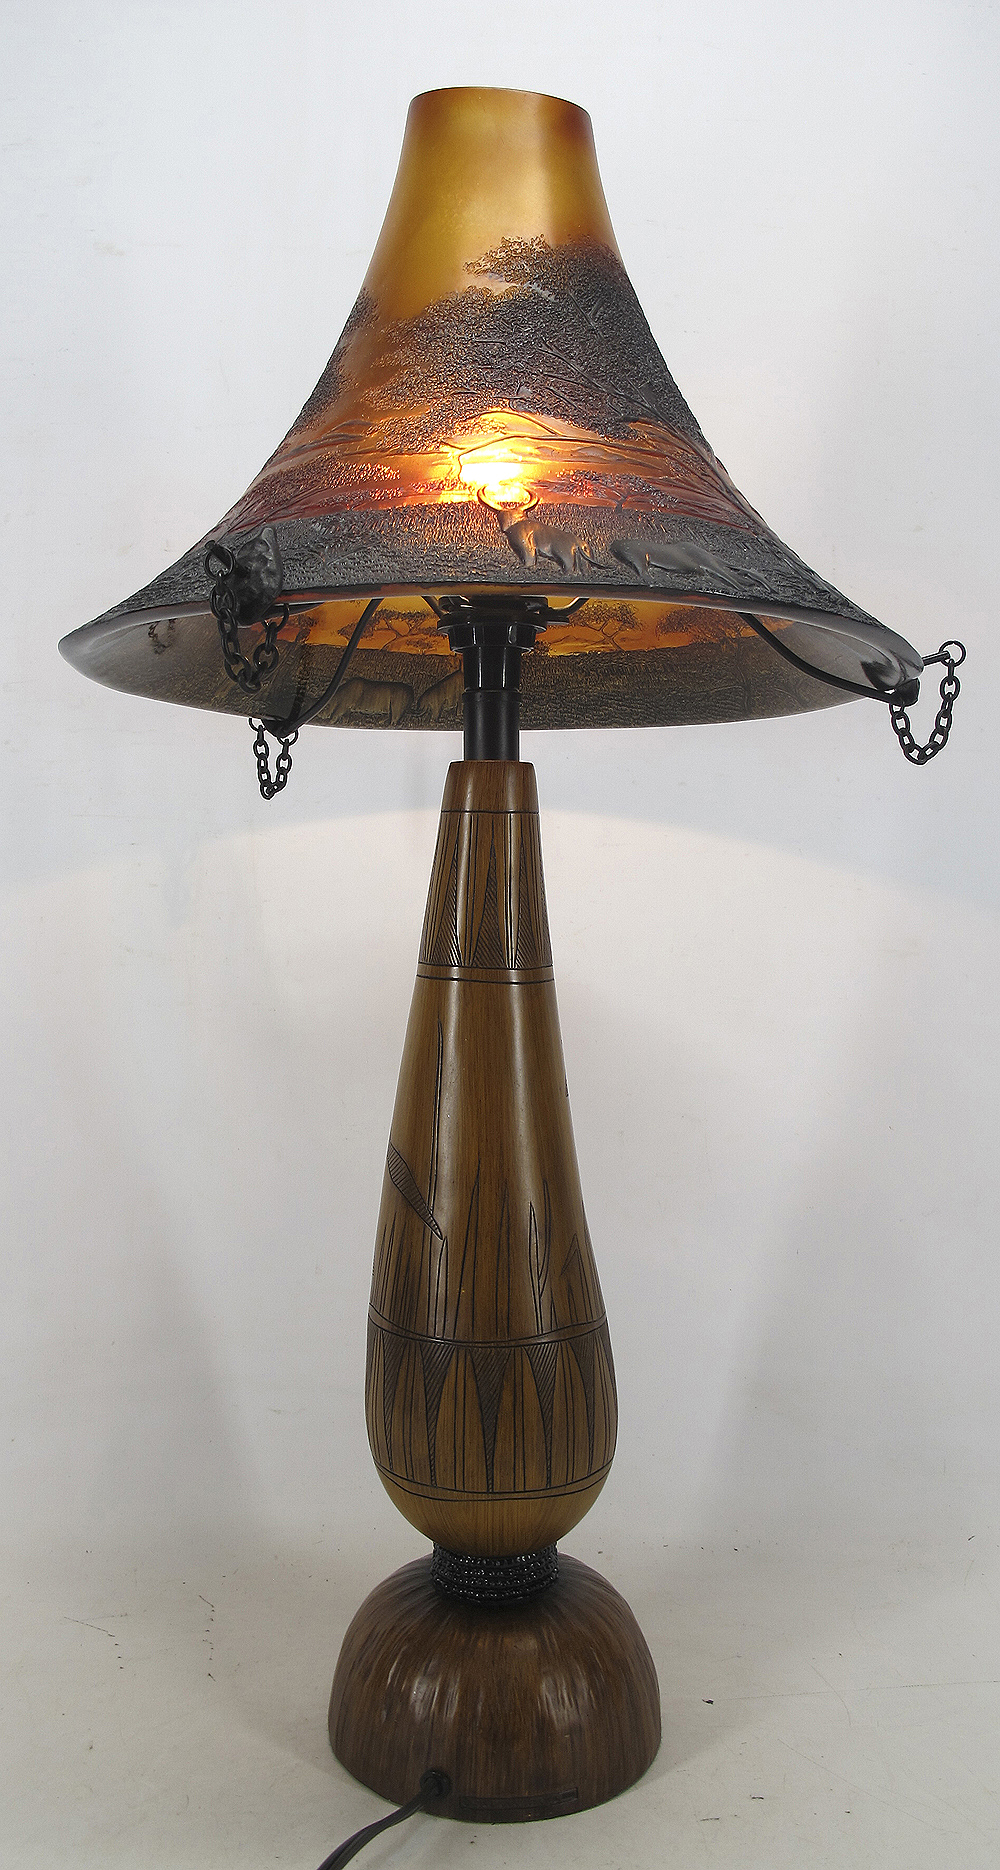 vtg maasai collection tribal serengeti working wood table lamp w resin shade yqz ebay. Black Bedroom Furniture Sets. Home Design Ideas